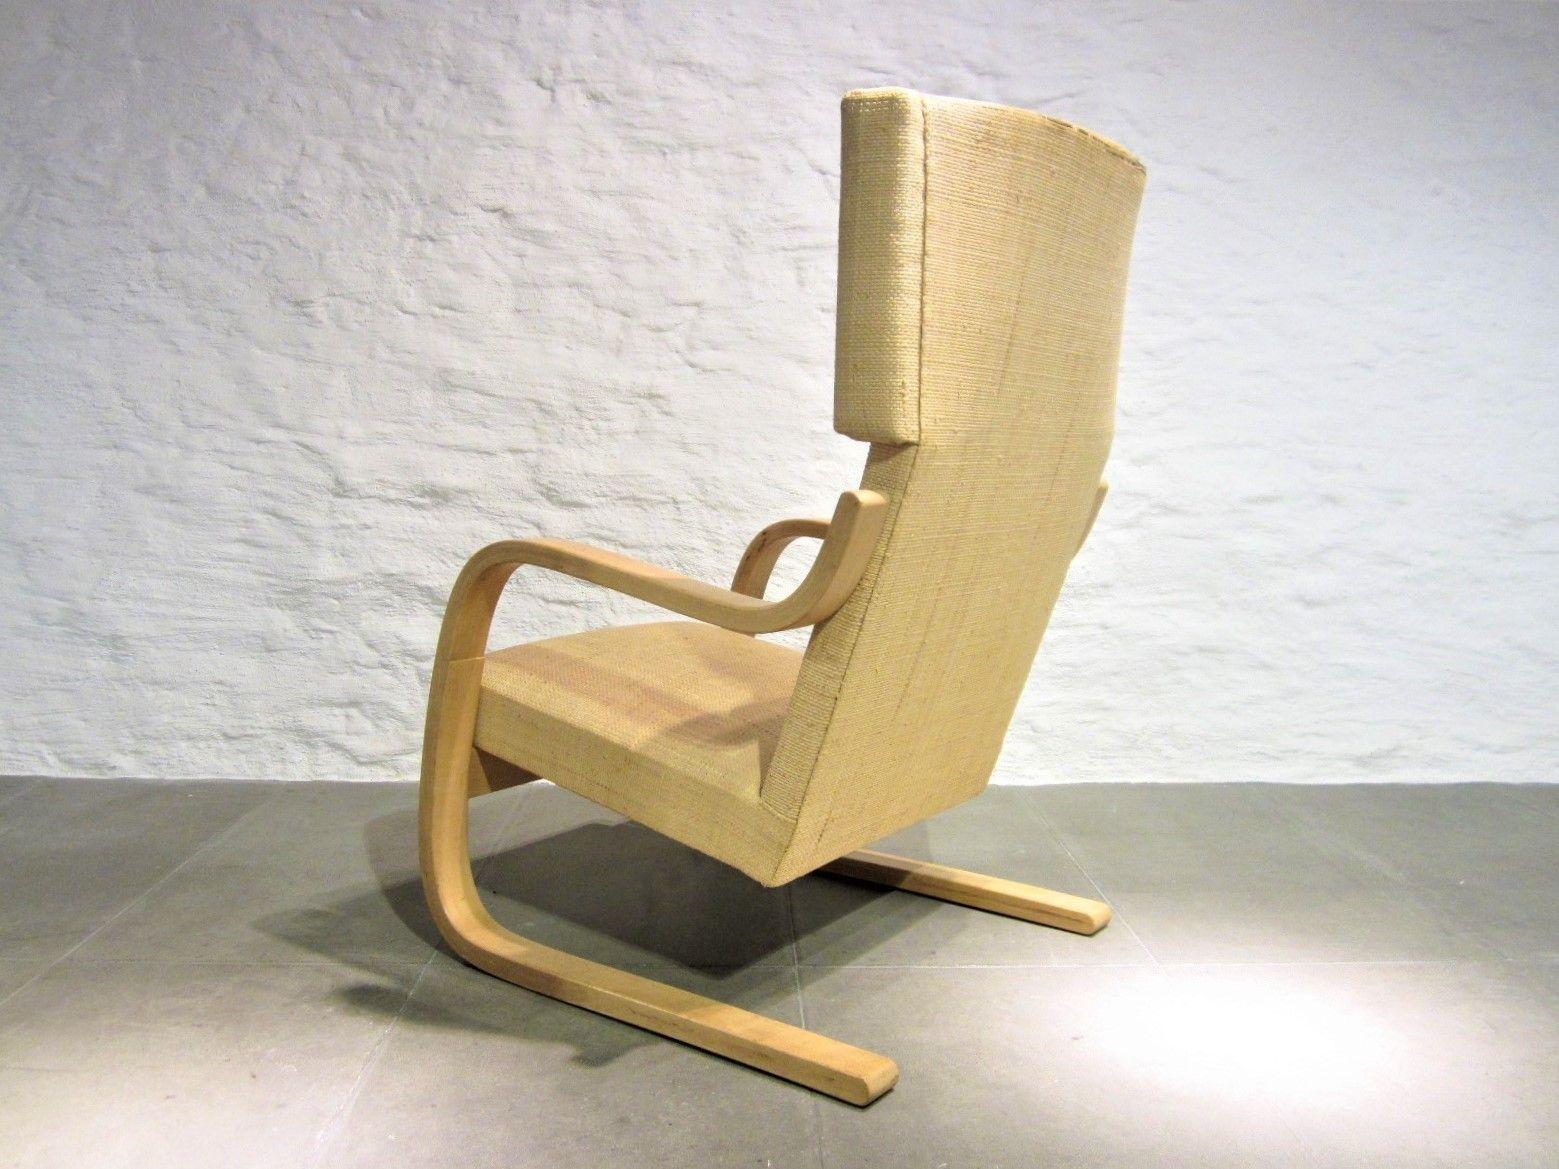 modell 401 sessel mit hoher r ckenlehne von alvar aalto. Black Bedroom Furniture Sets. Home Design Ideas